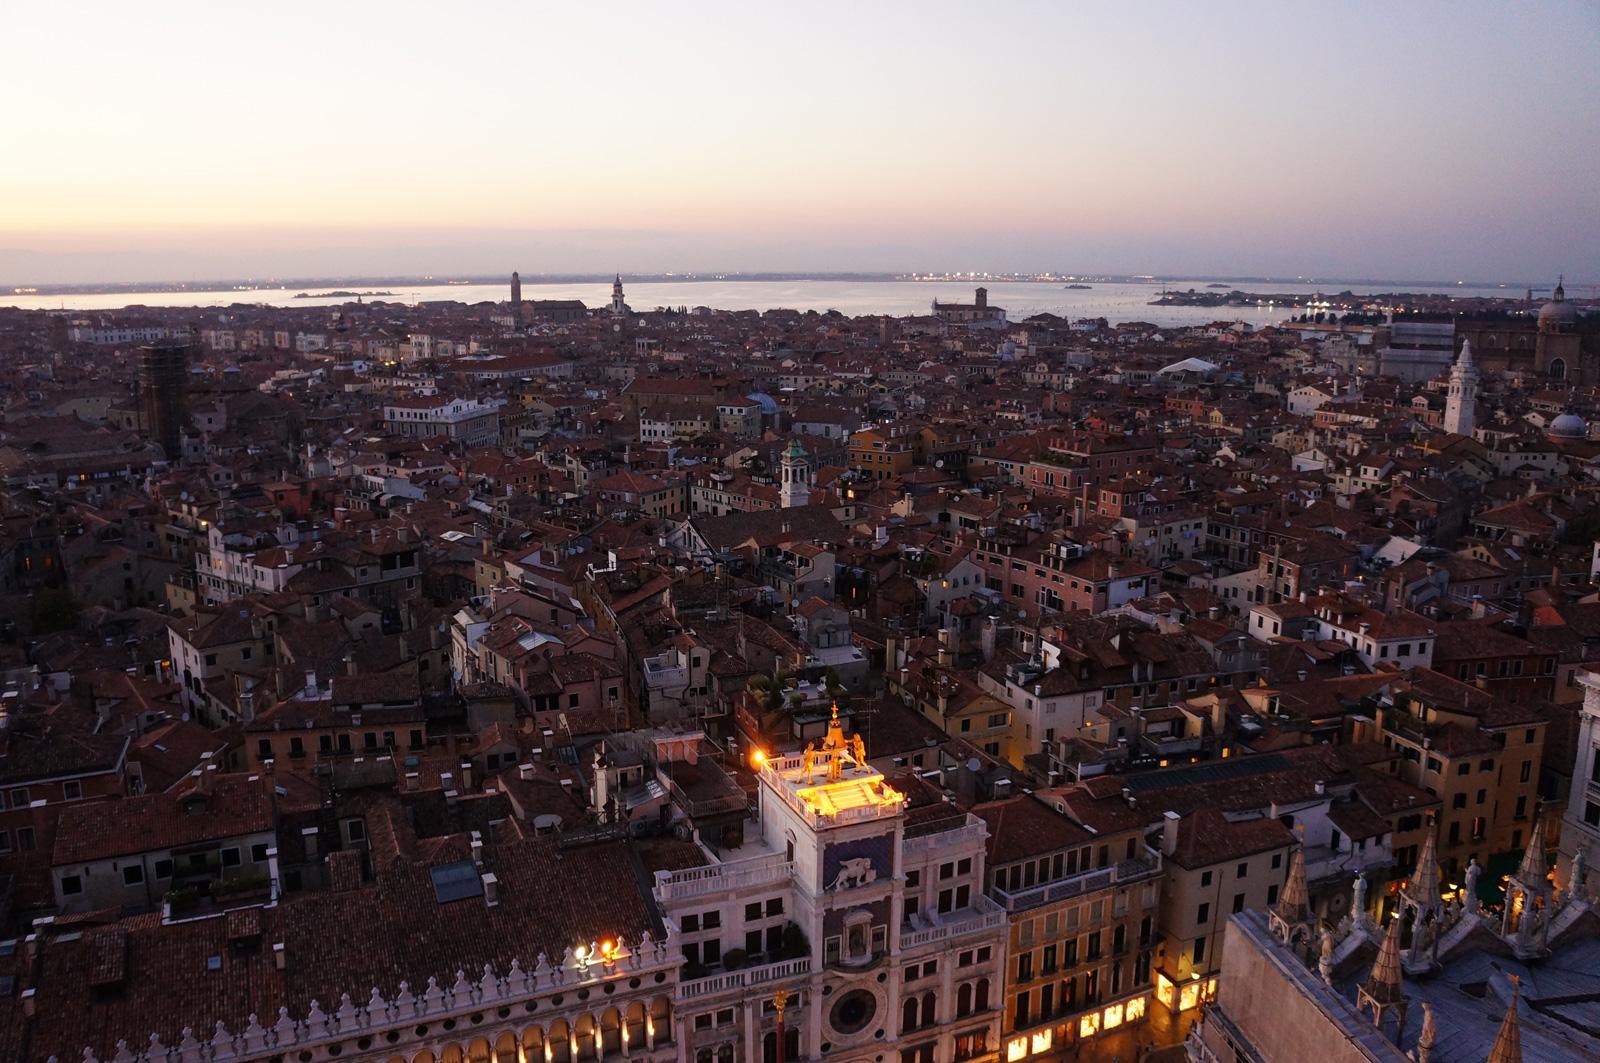 Venice Roof Landscape